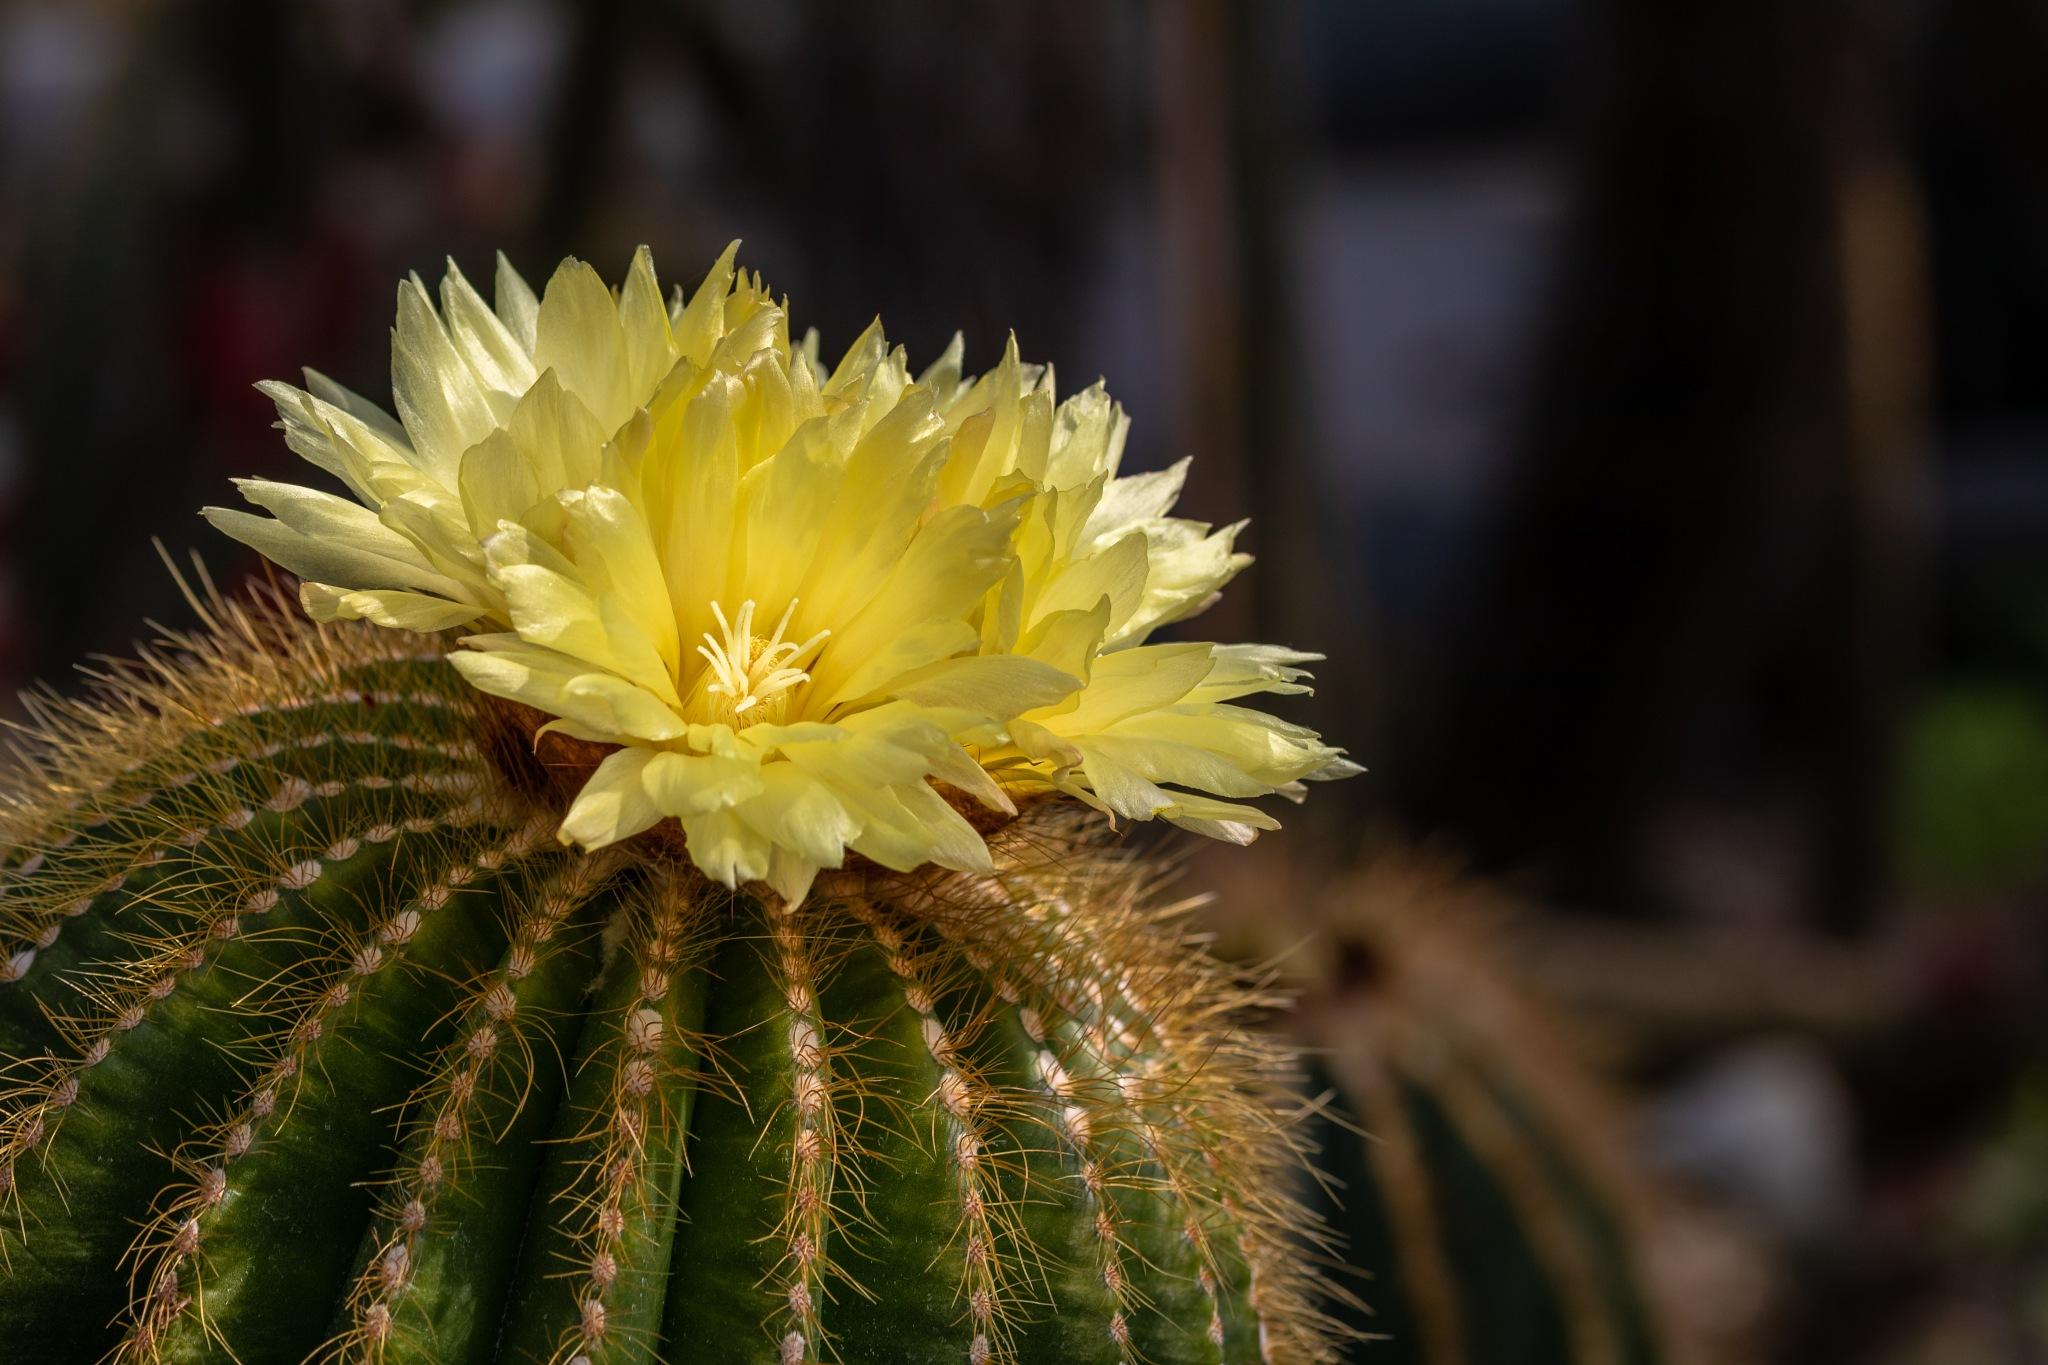 Kaktusblüte by Sven Kuhn